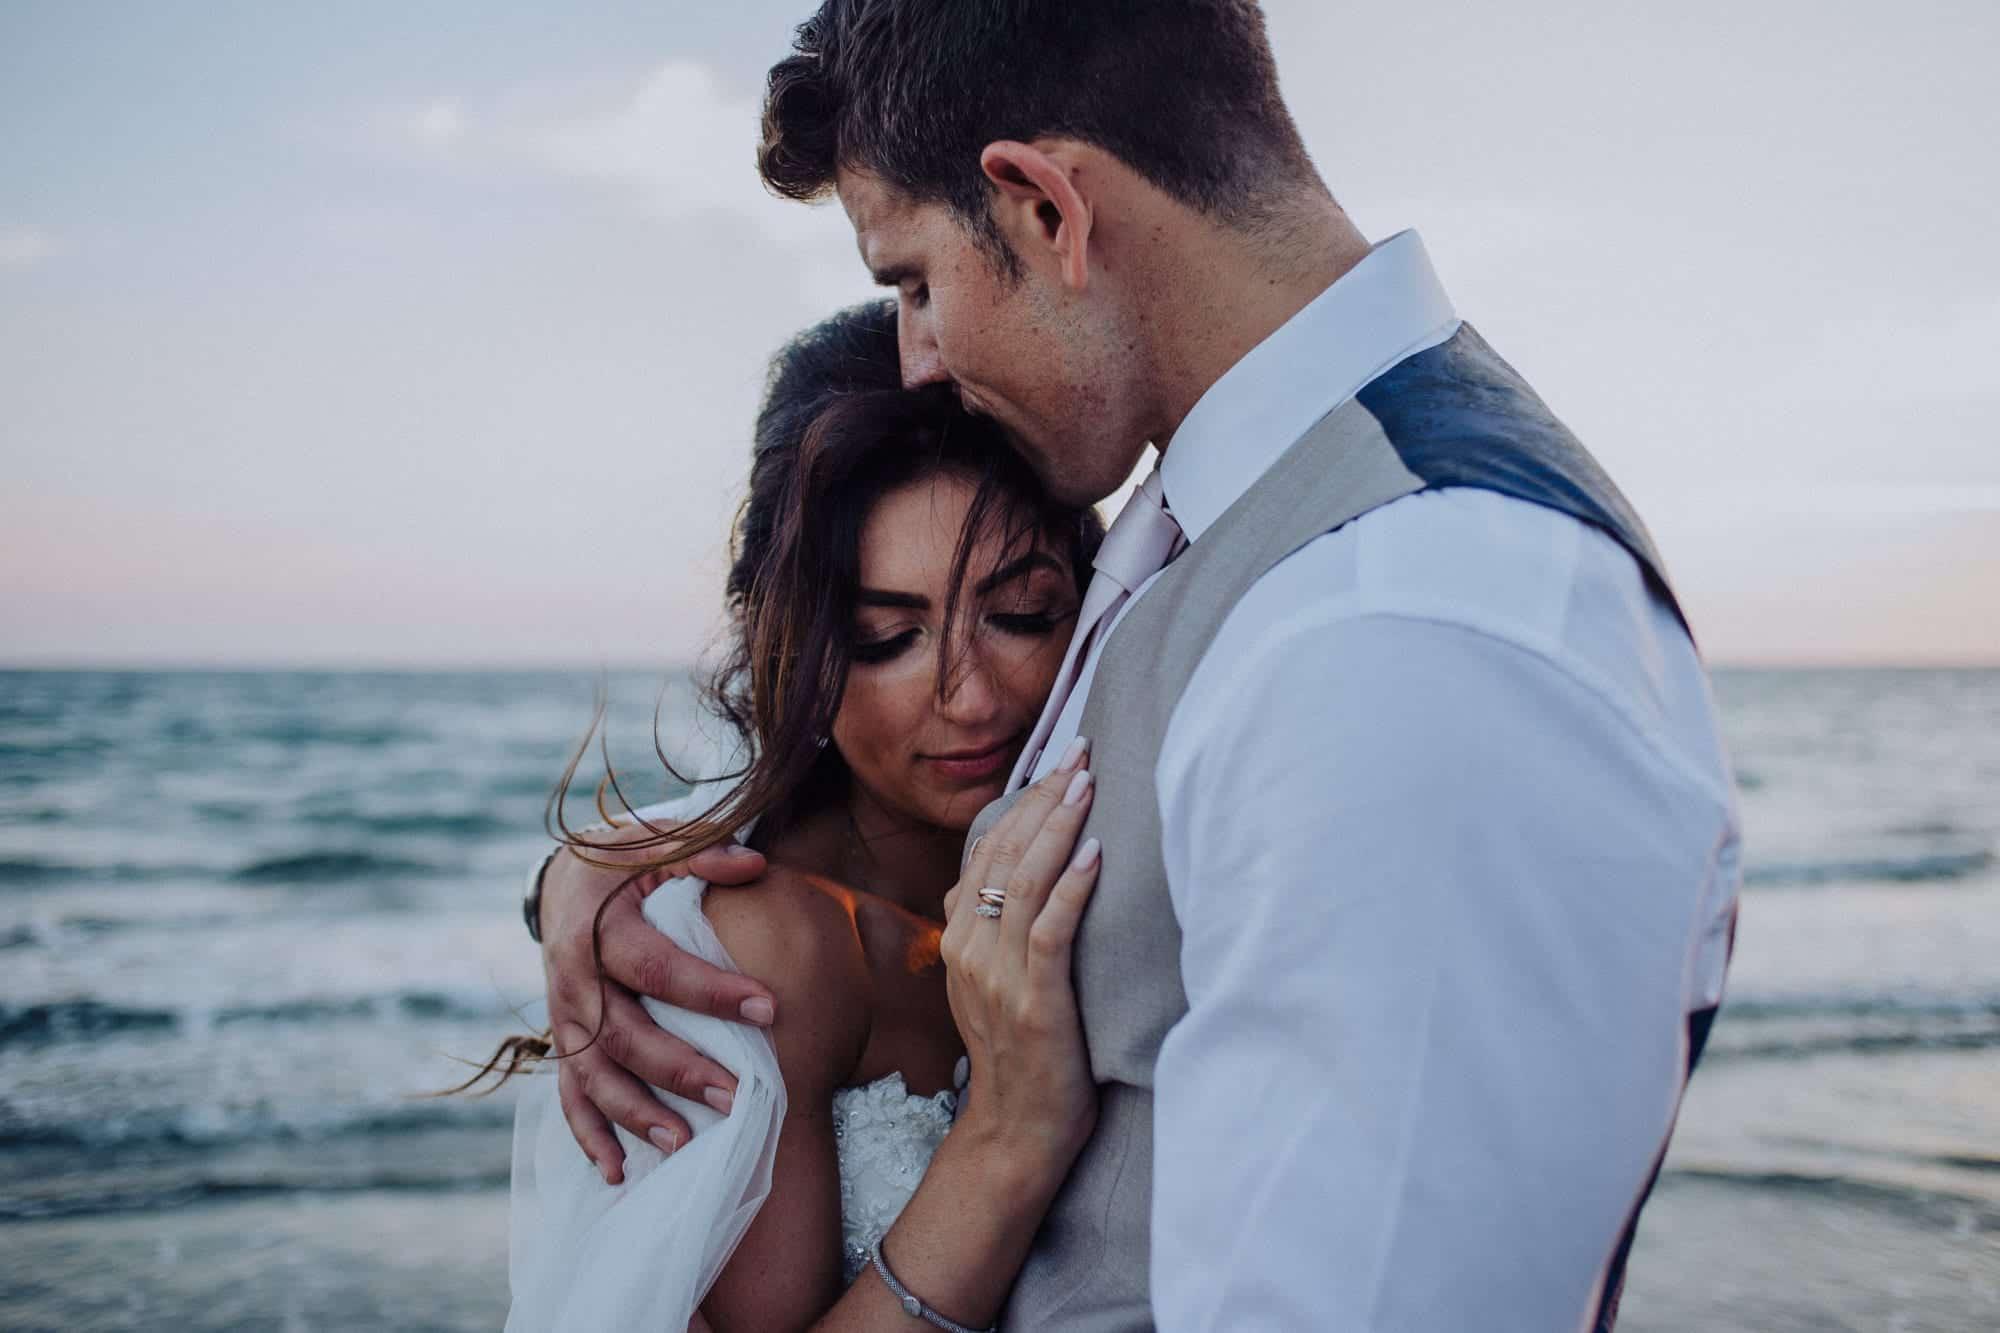 356_Johnny&Kat_Wedding_EliasBeachHotel_Limassol_Cyprus_ManonPauffinPhotography__MG_7747_LOres